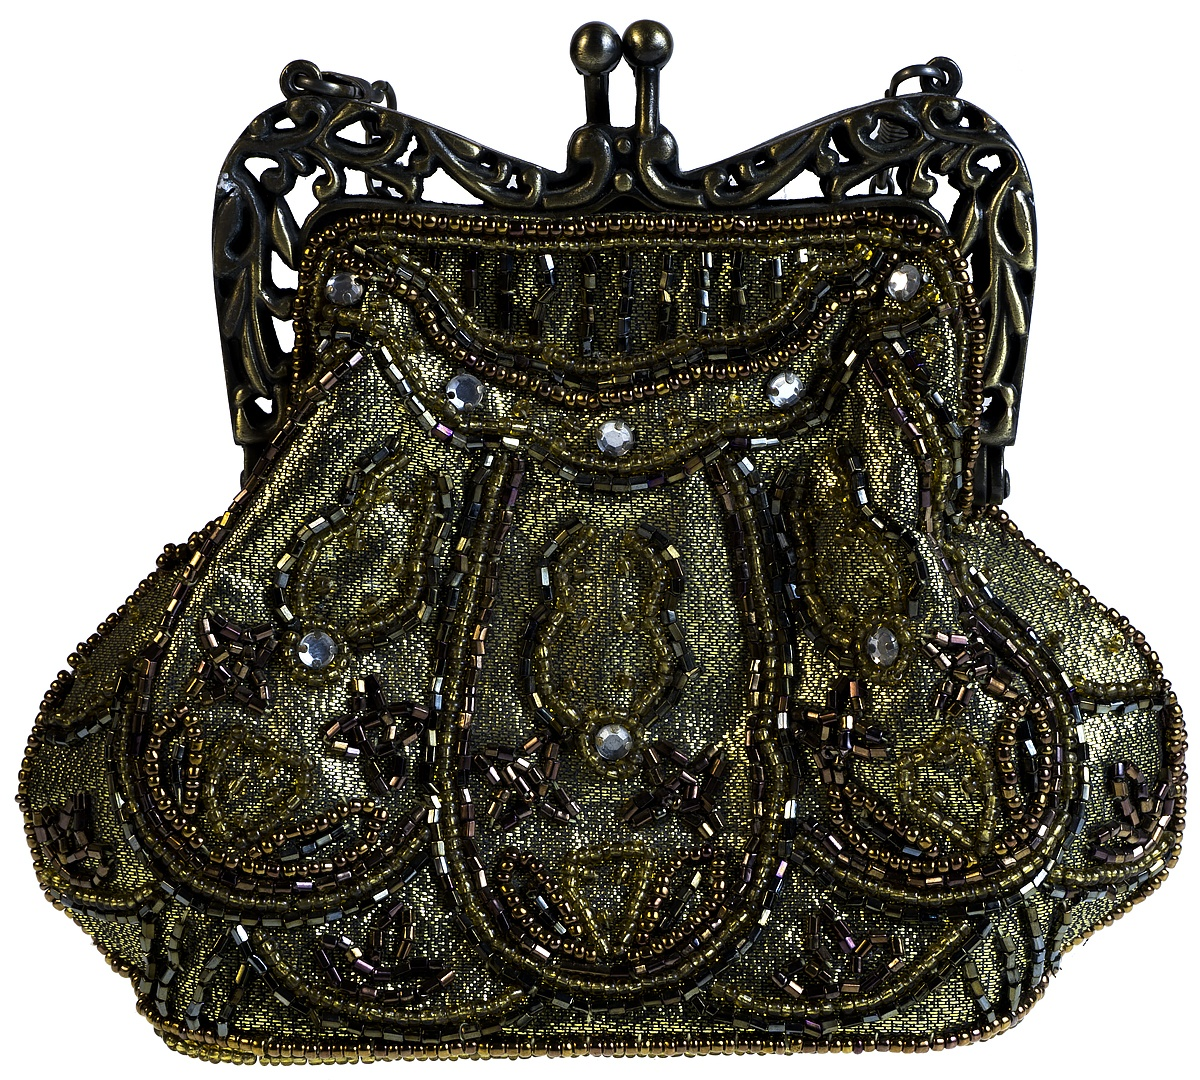 Сумочка дамская. Текстиль, металл, бисер, стразы. Западная Европа, 1960-е гг. Нет бренда